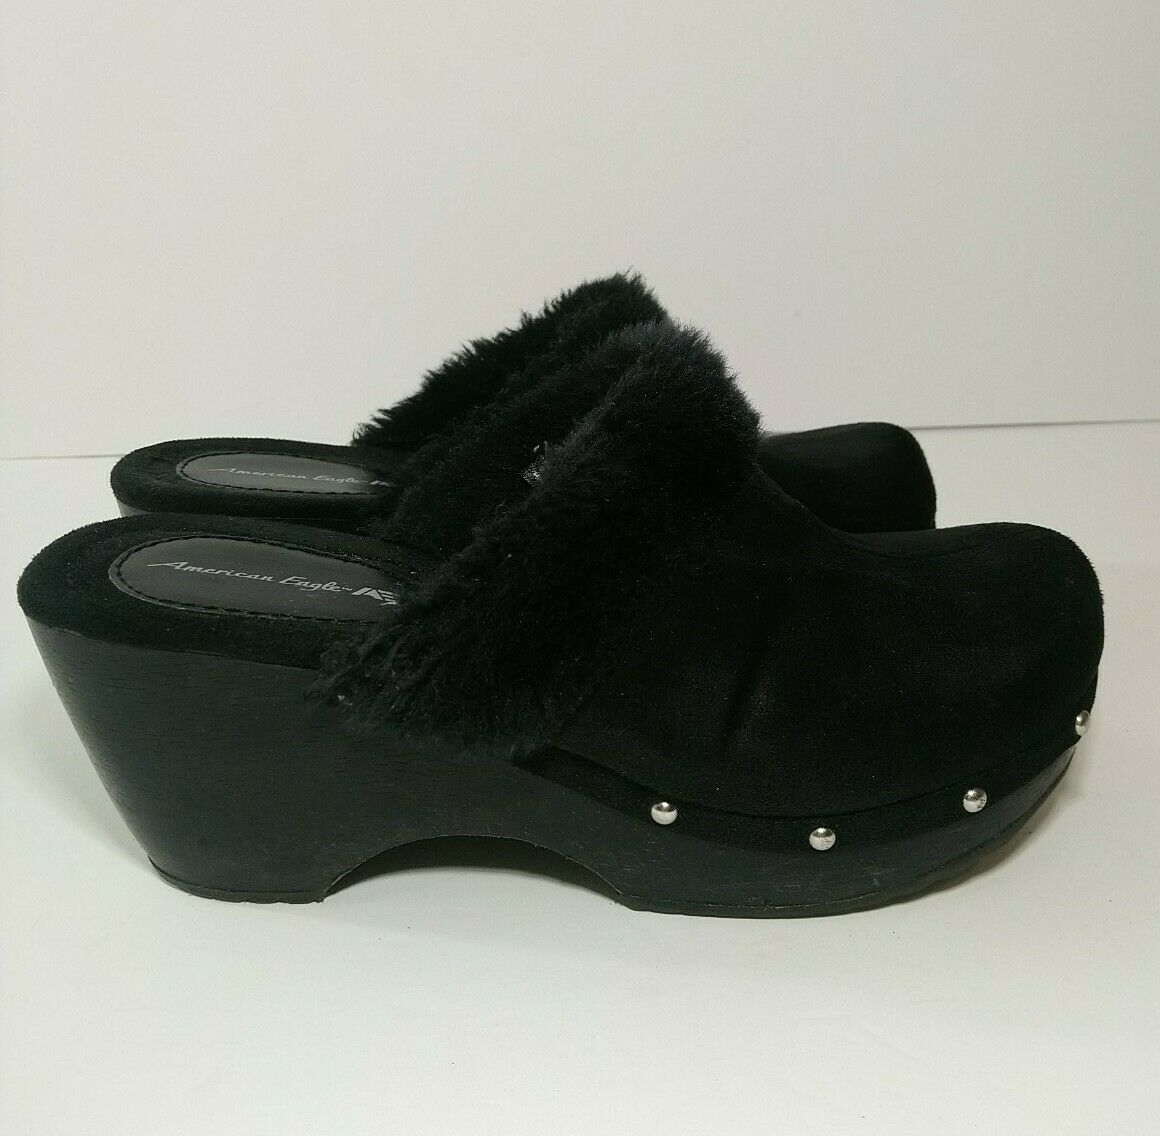 Vintage 90s Y2K American Eagle Chunky Platform Clog Heels Black 8